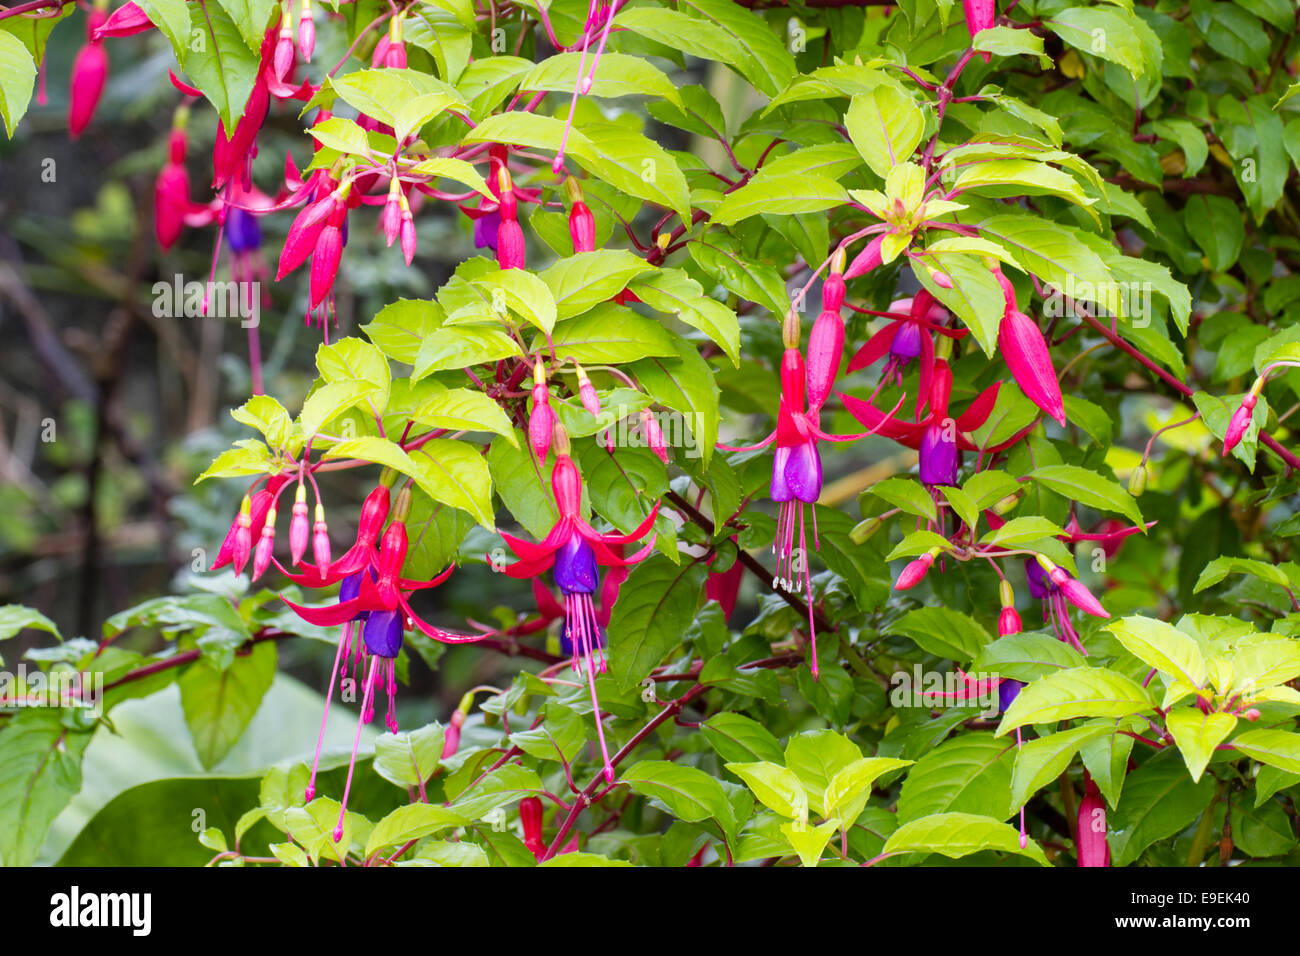 Bright Fuchsia Flowers Adorn The Semi Evergreen Golden Foliage Of